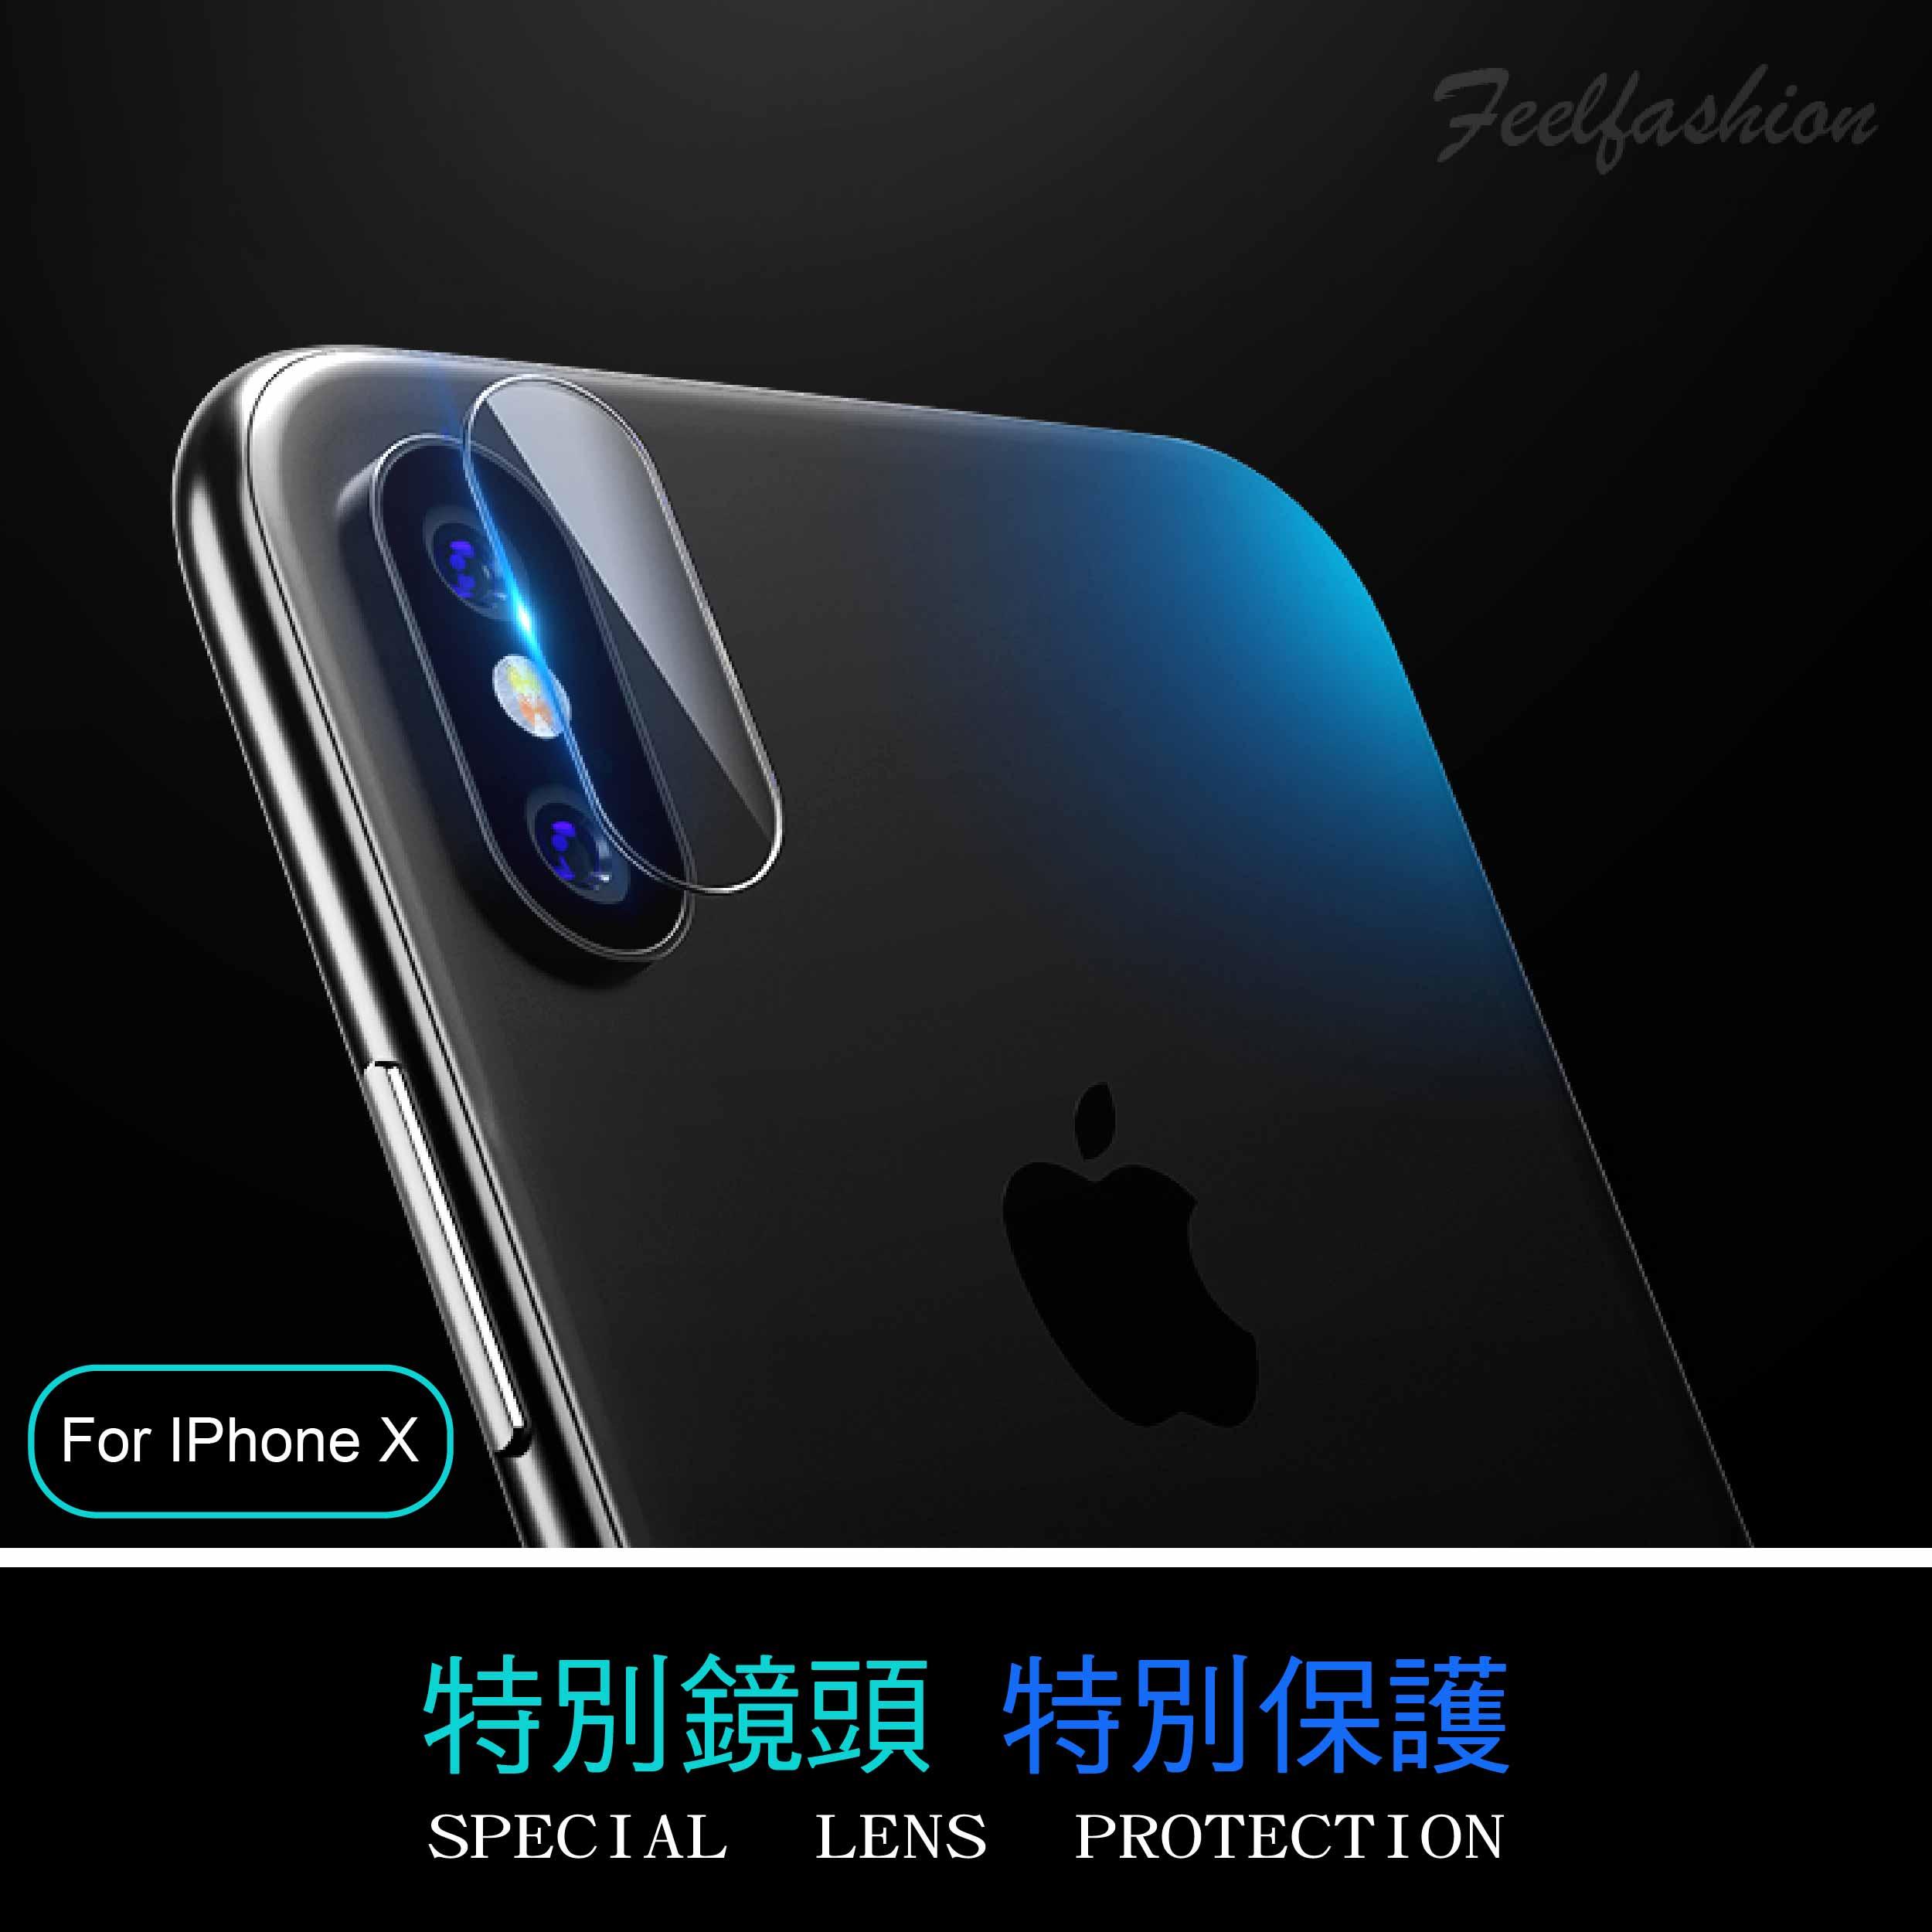 iPhone X / Xs 超薄 0.2mm 9H硬度 鋼化 鏡頭保護膜 透明玻璃貼 2入